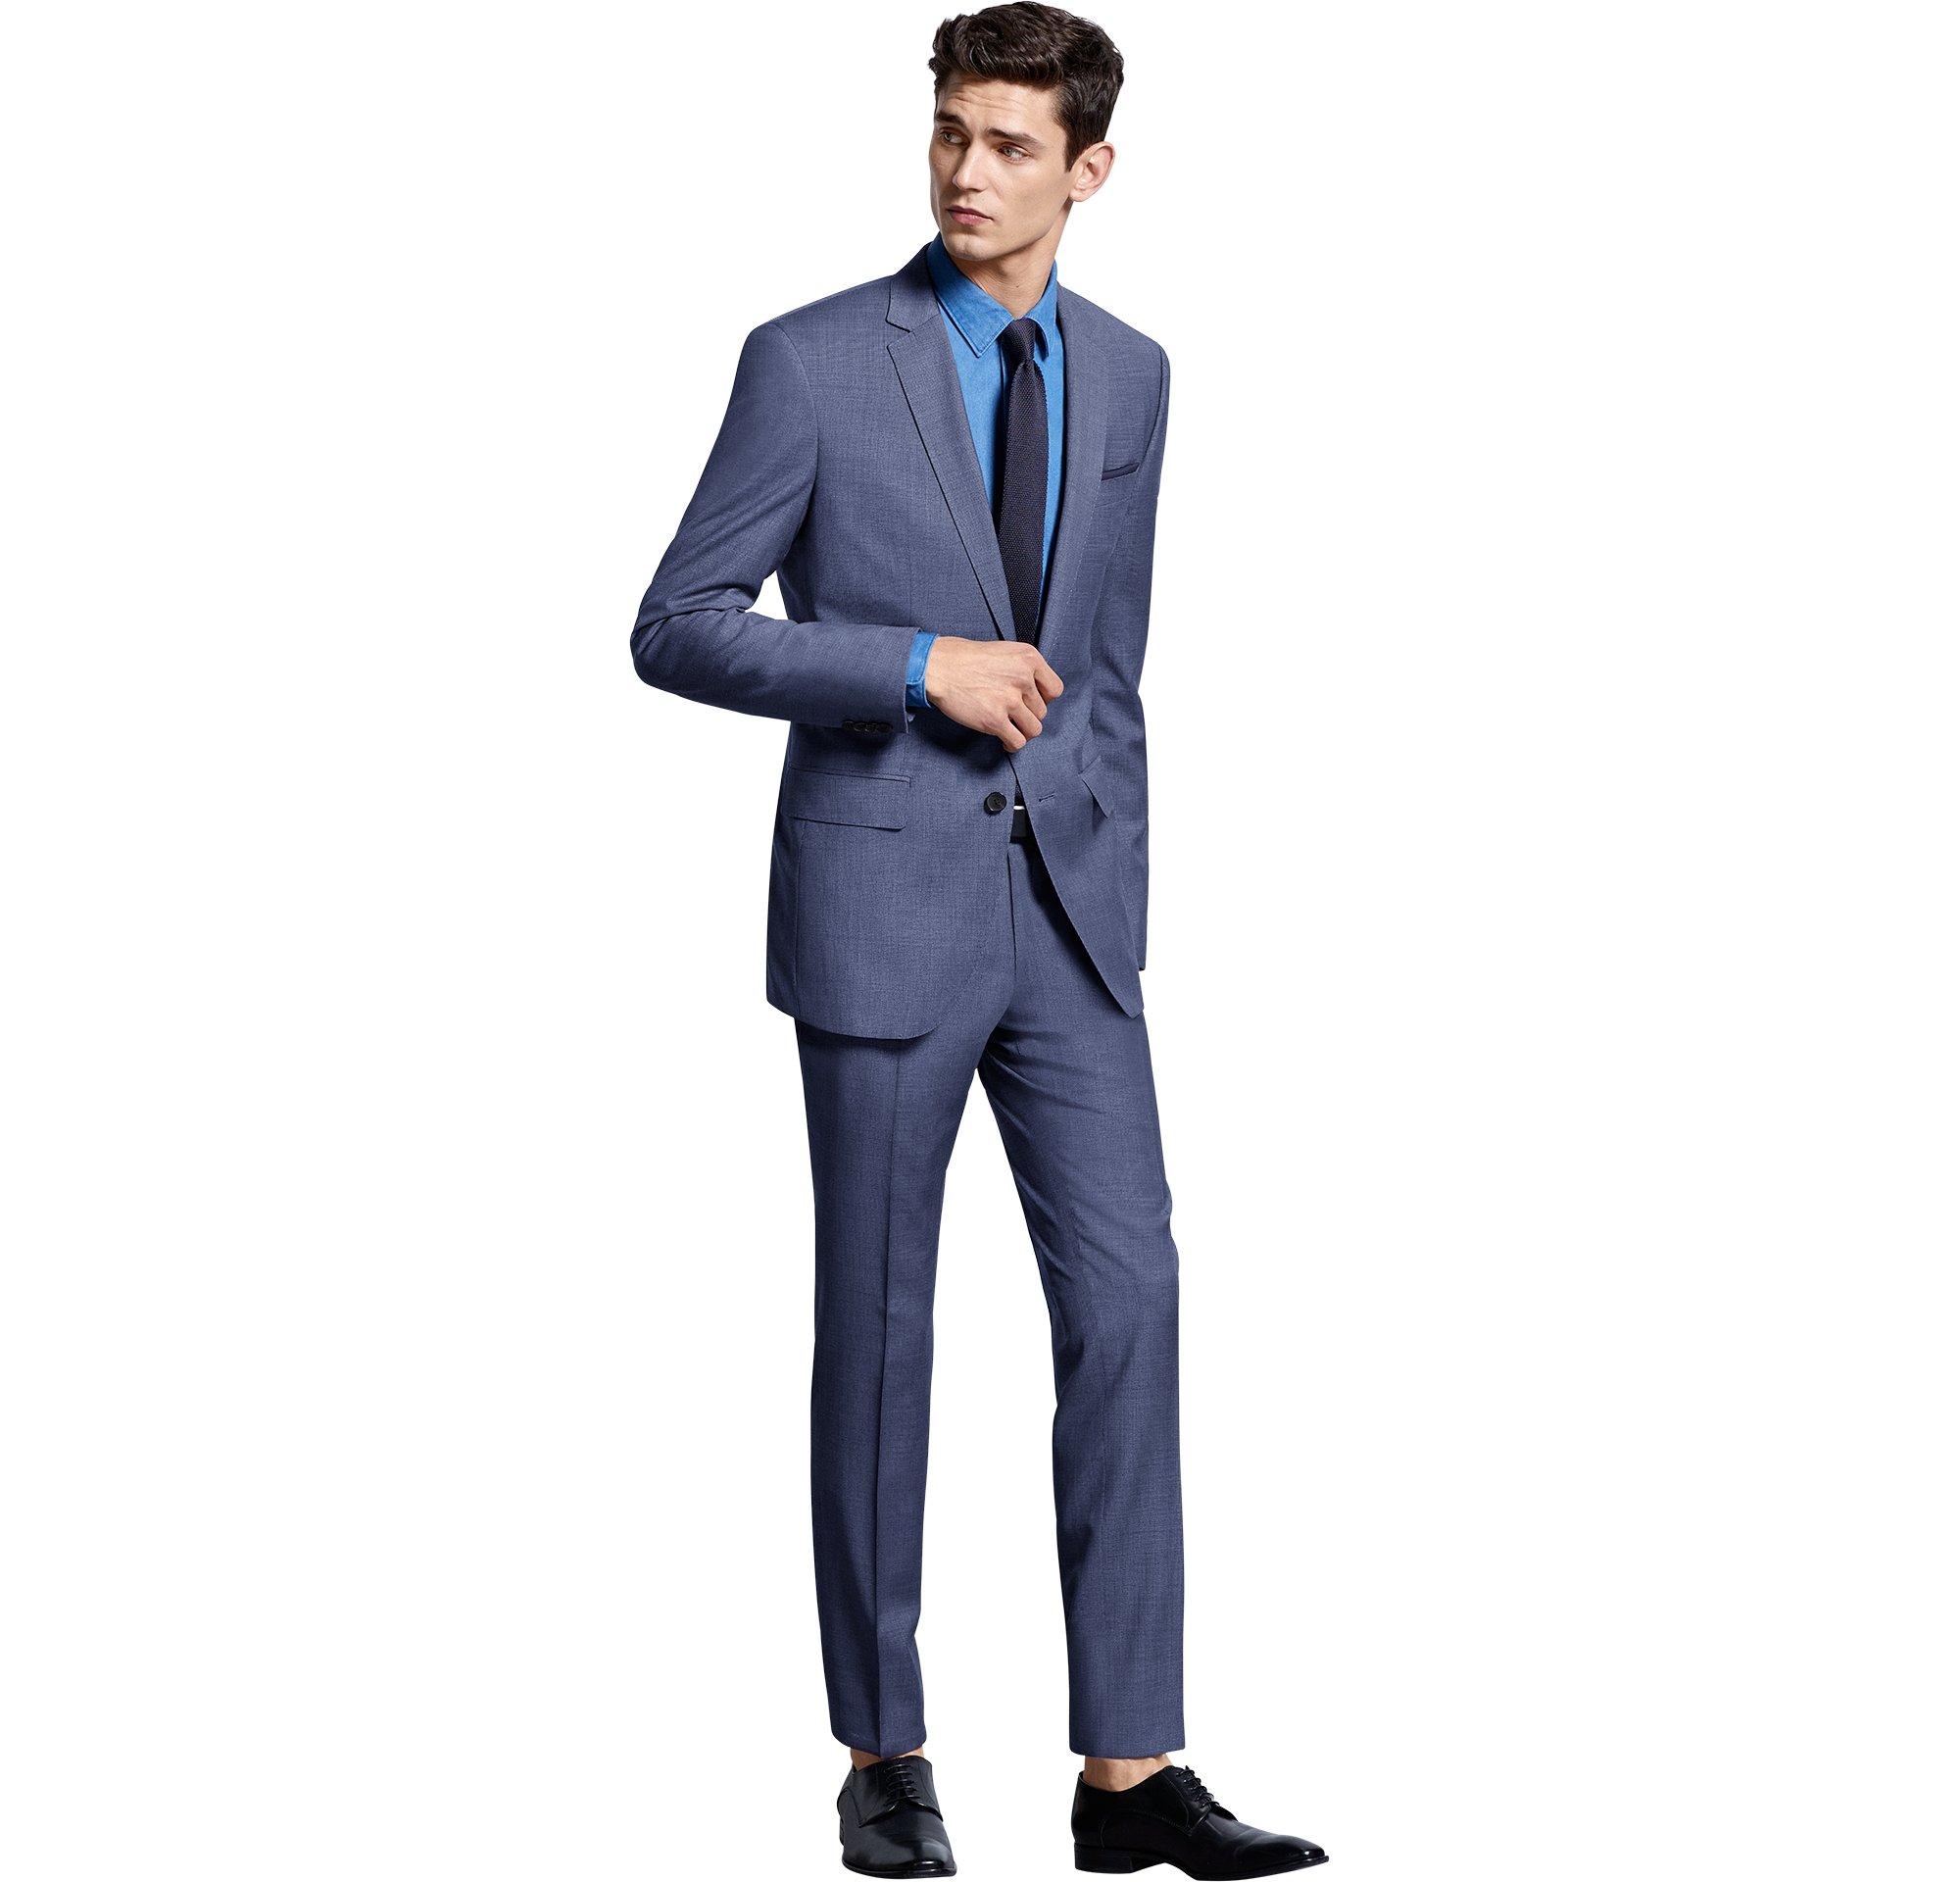 BOSS_Men_SR17SR_Suit499_Look_3,